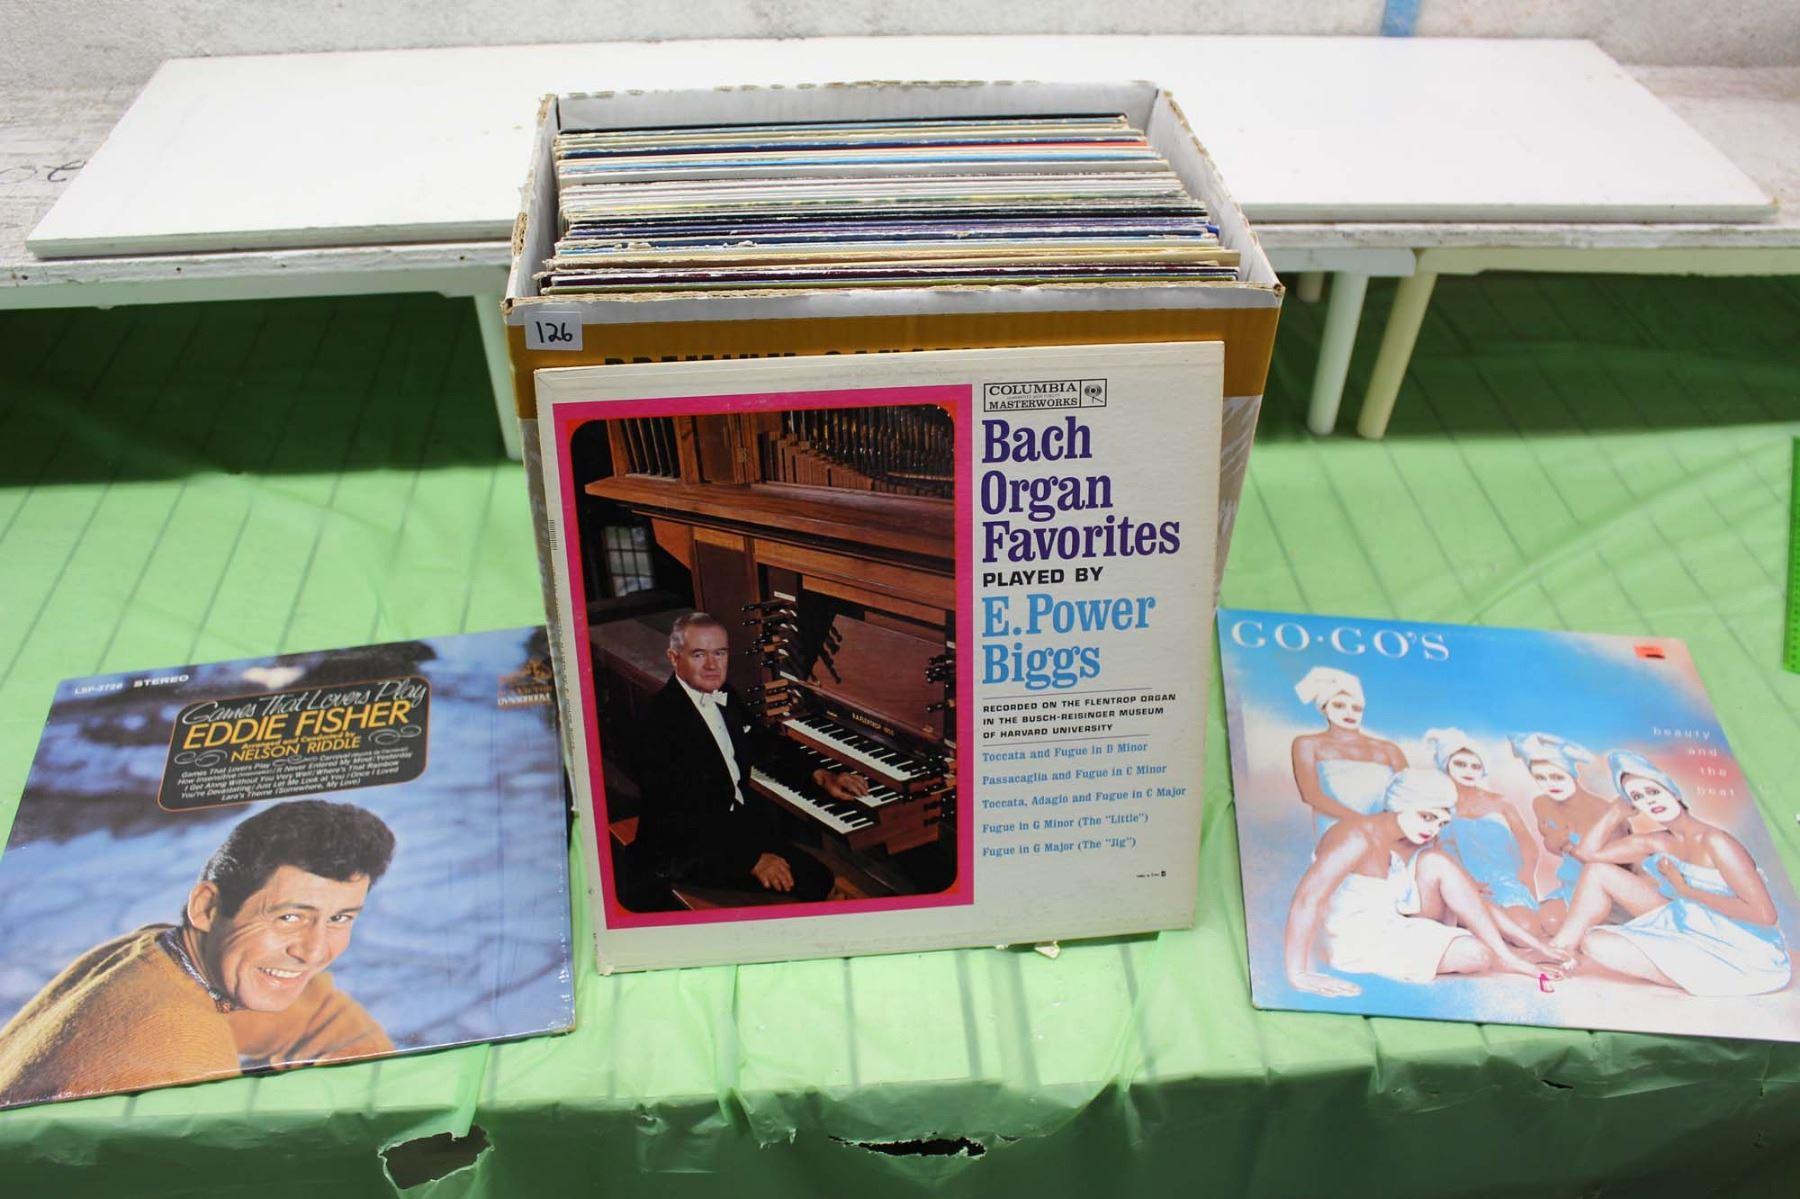 Misc Records (Go Gos, Bach organ Favorites, Eddie Fisher, Etc